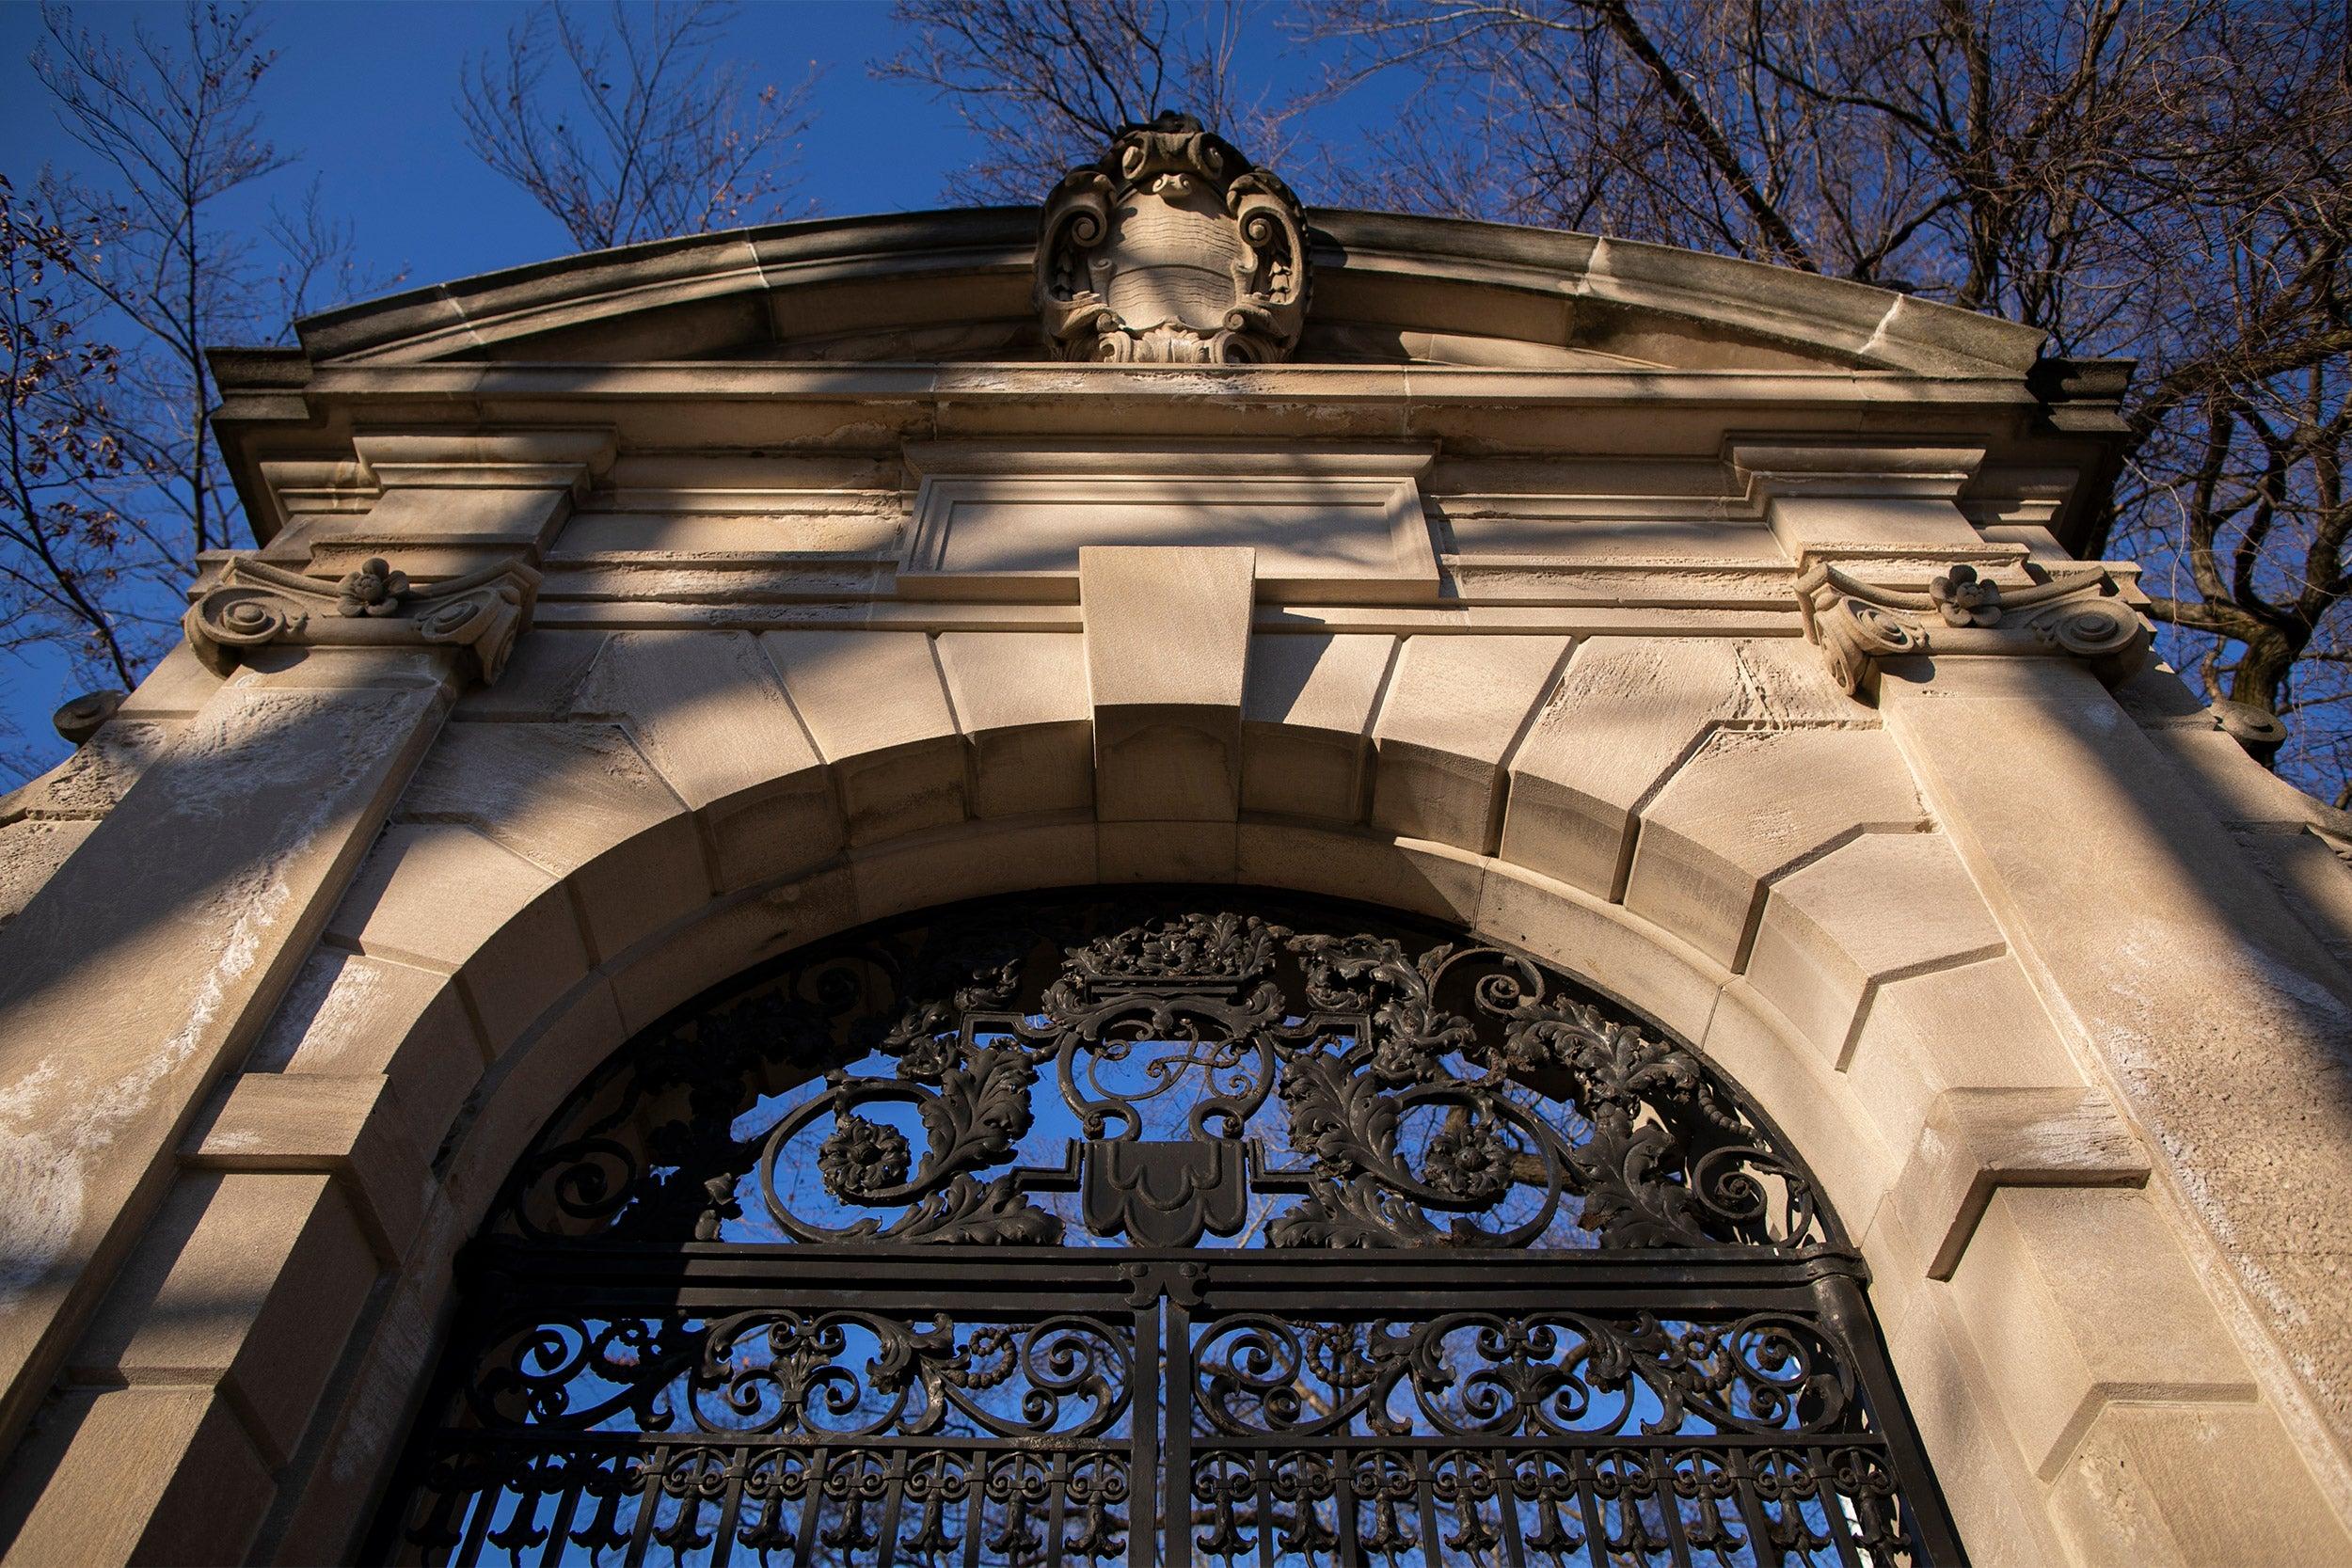 One of Harvard's many ornate gates.